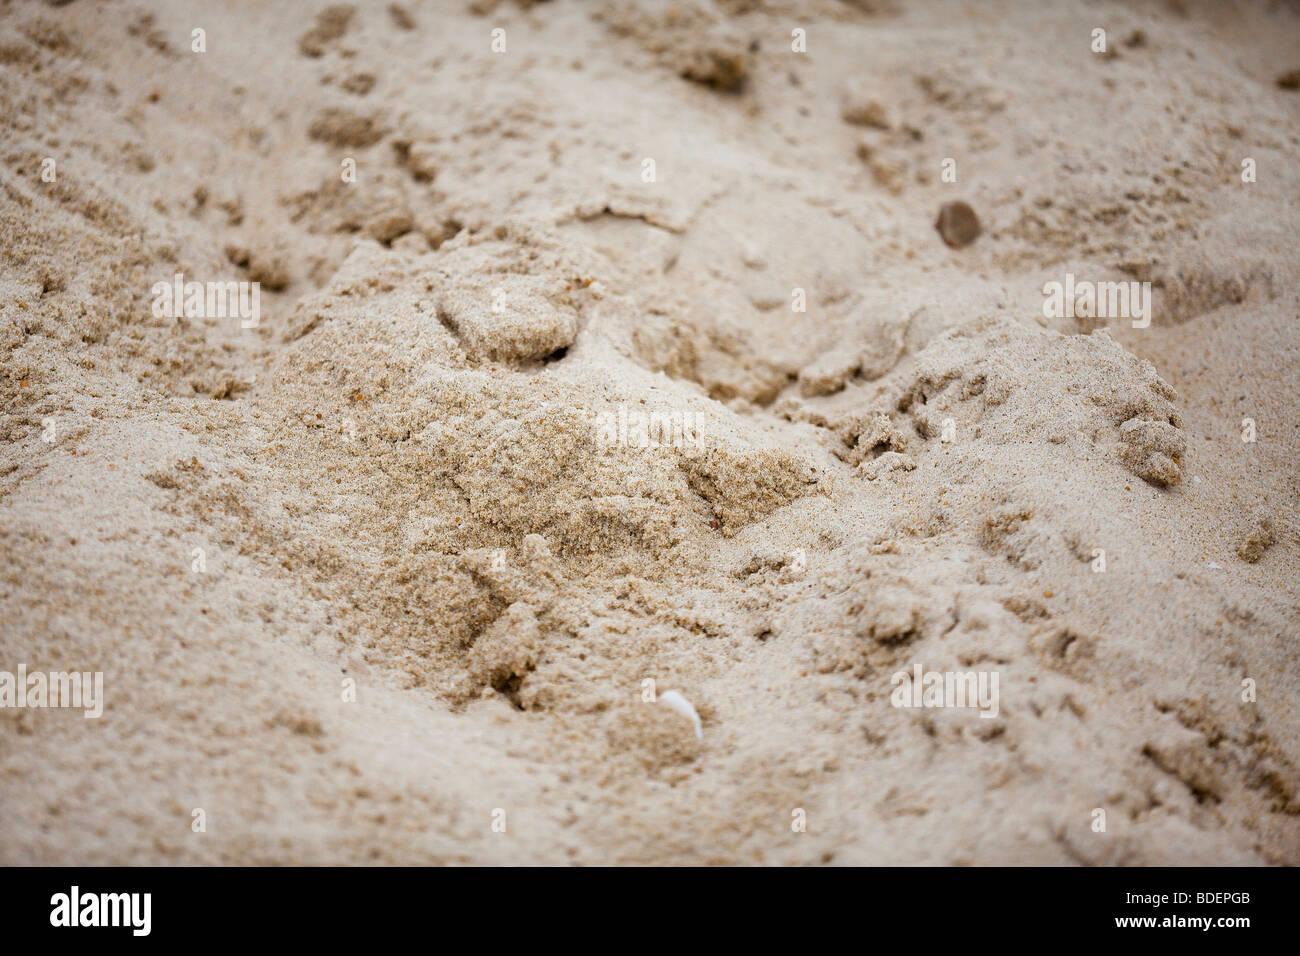 Sand on the beach - Stock Image